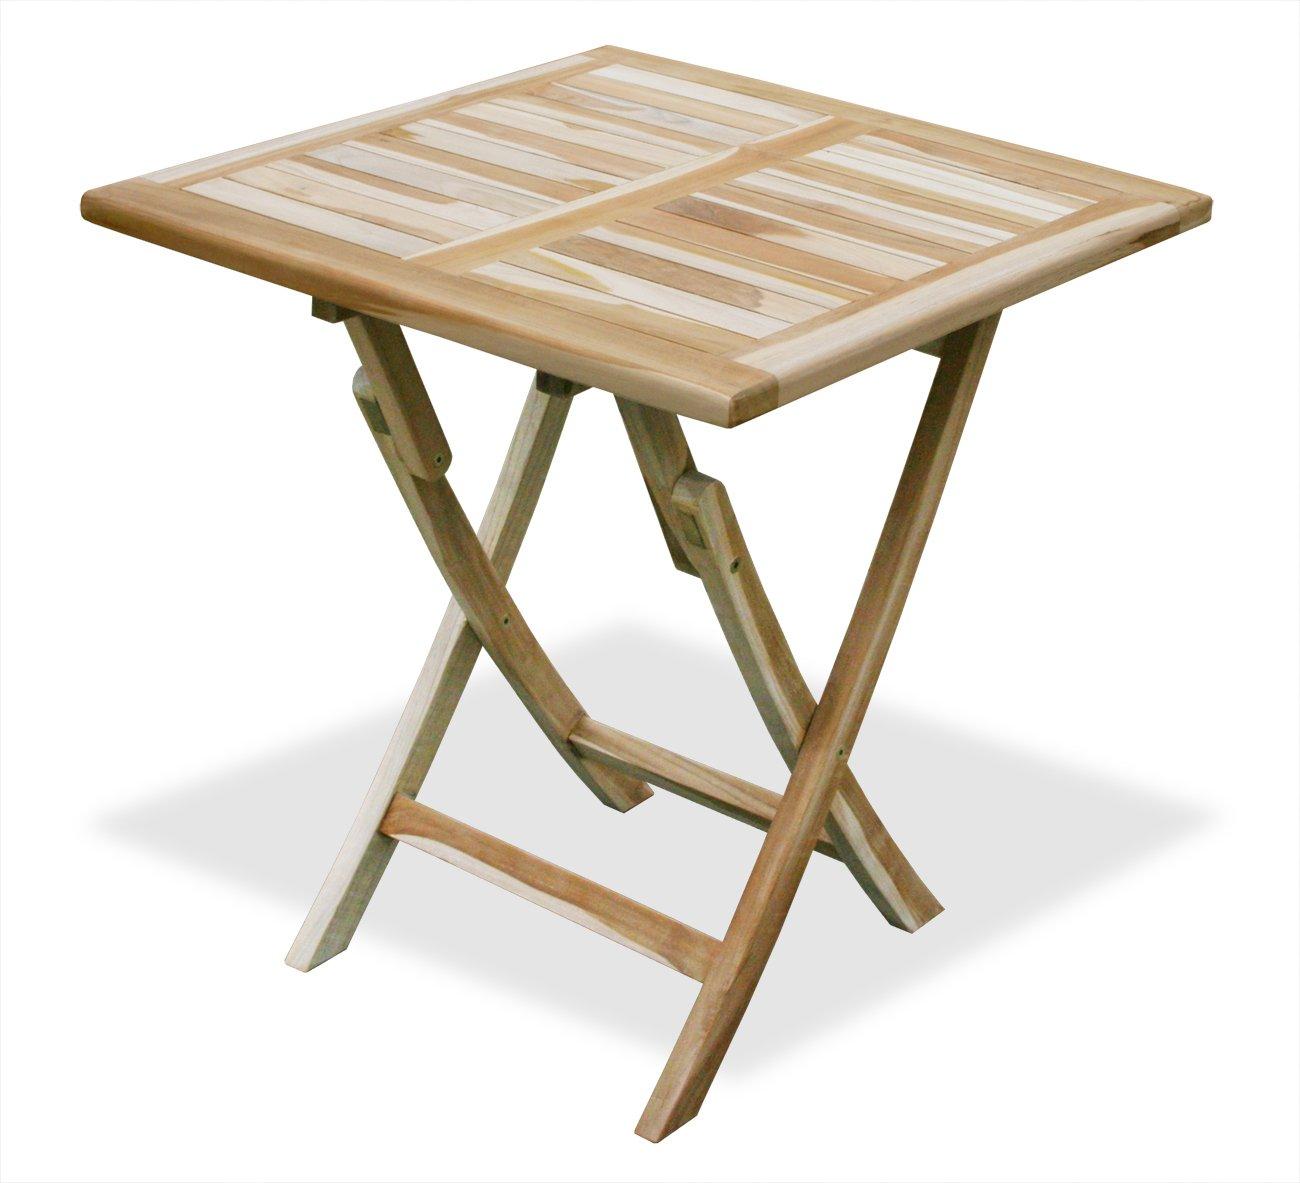 KMH®, Klapp - Tisch / Beistelltisch - ECHT TEAK! (70 x 70 cm) (#102027)